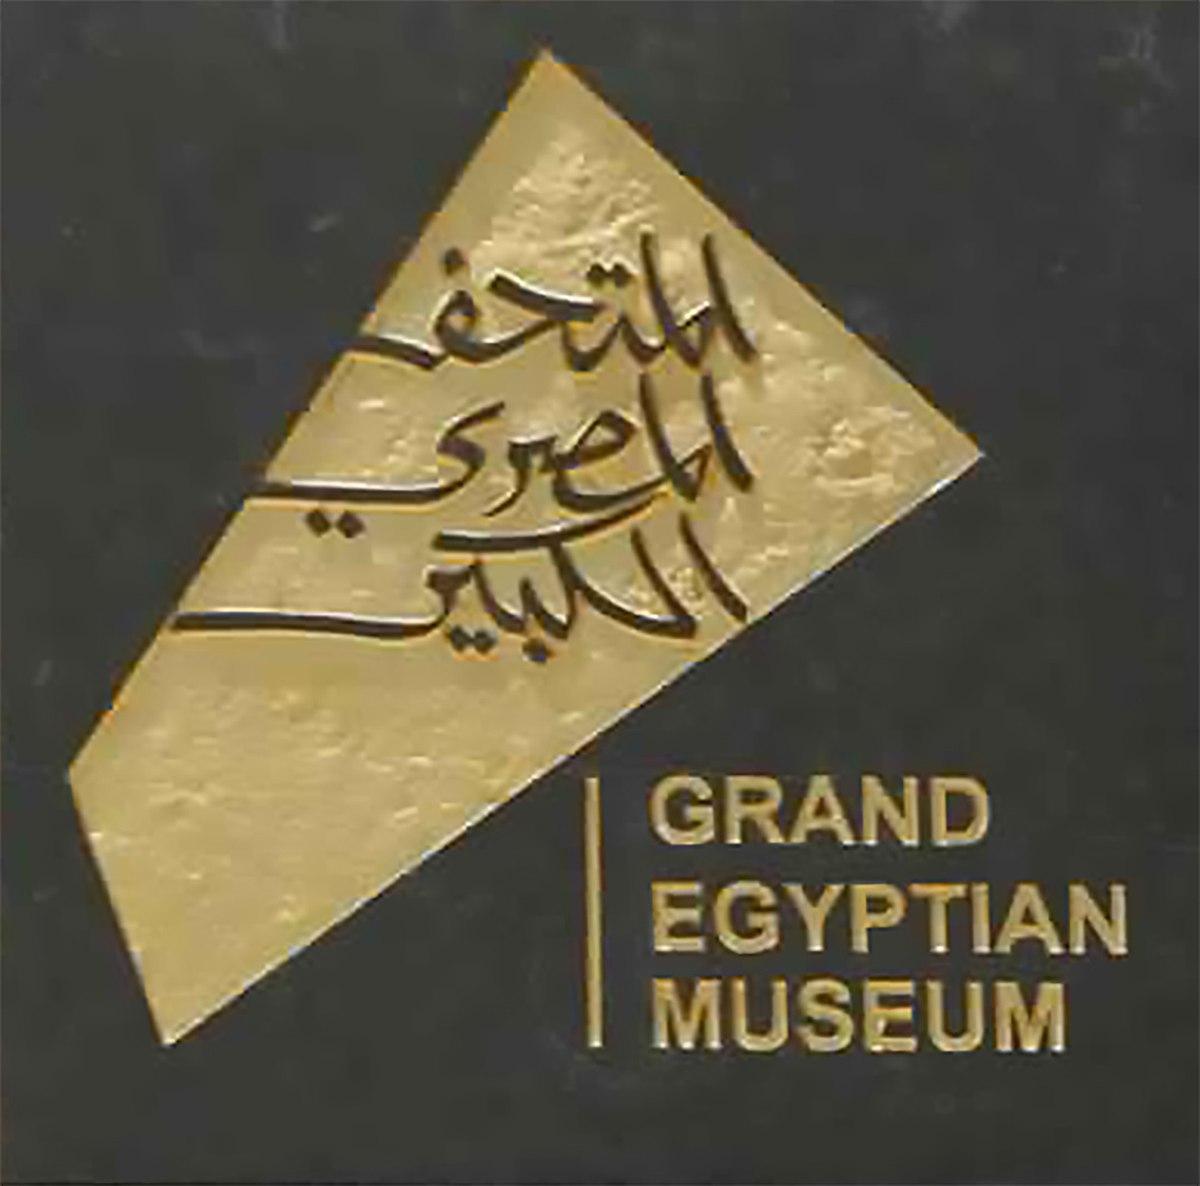 ee7d8db4e المتحف المصري الكبير - ويكيبيديا، الموسوعة الحرة